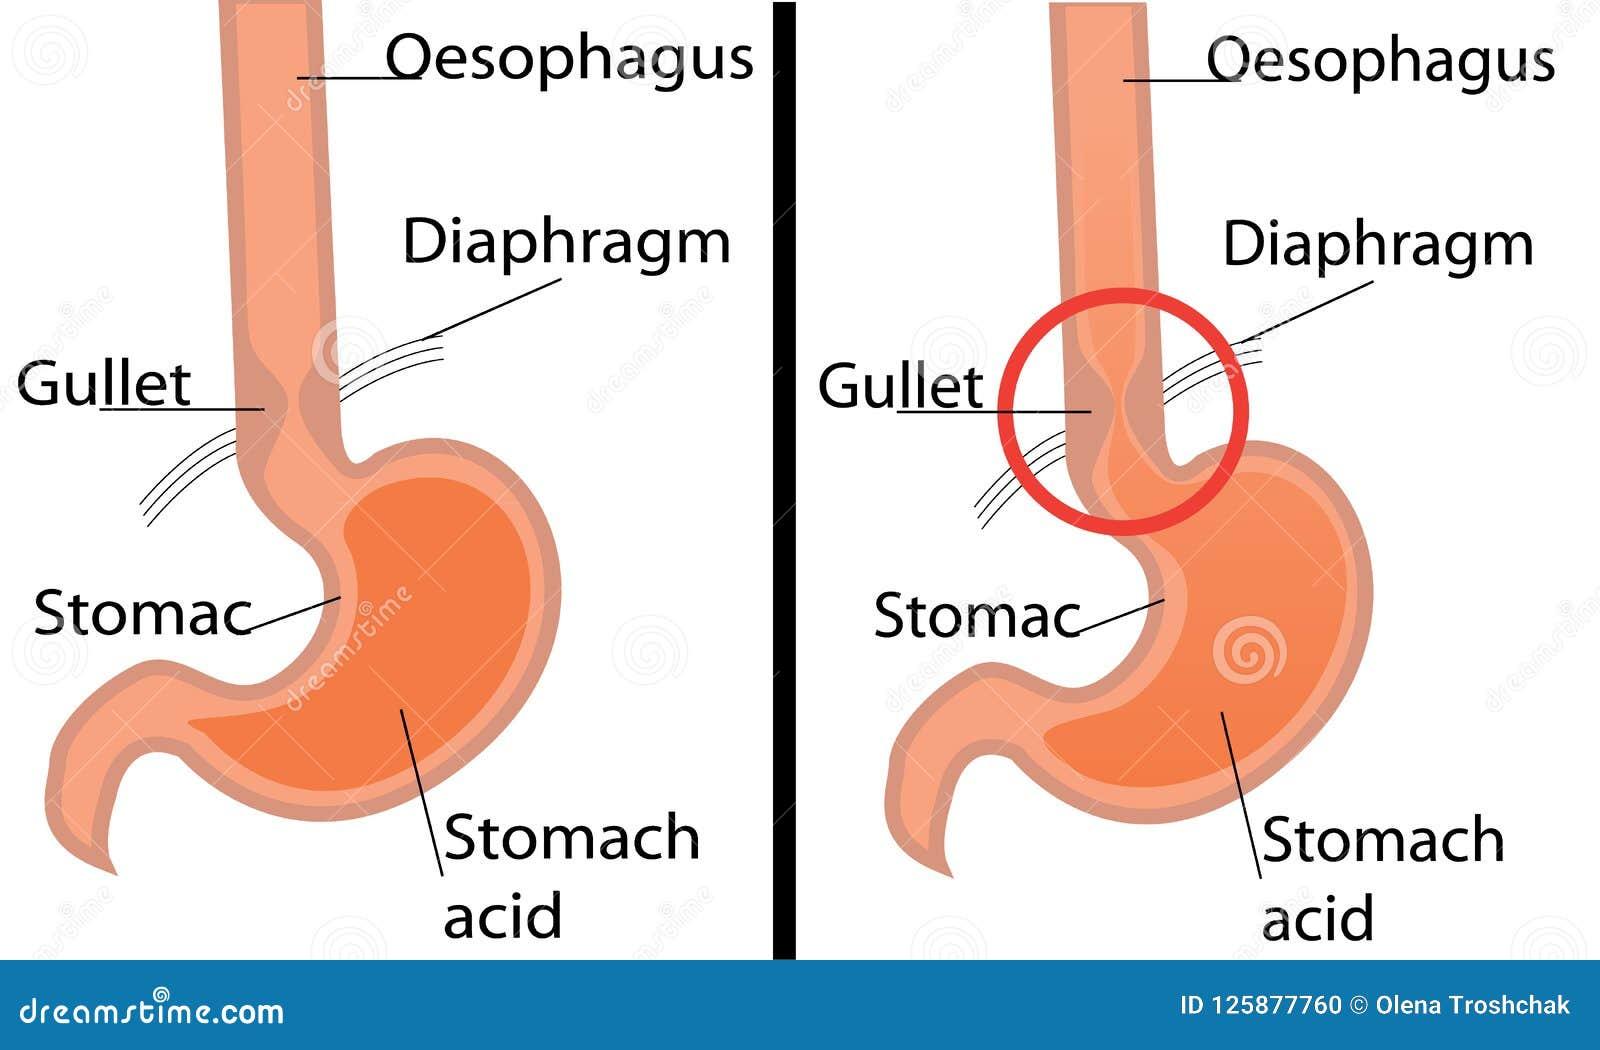 gastroesophageal reflux desease diagram healthy and gerd stomach Gerd Acid Reflux gastroesophageal reflux desease diagram healthy and gerd stomach vector illustration